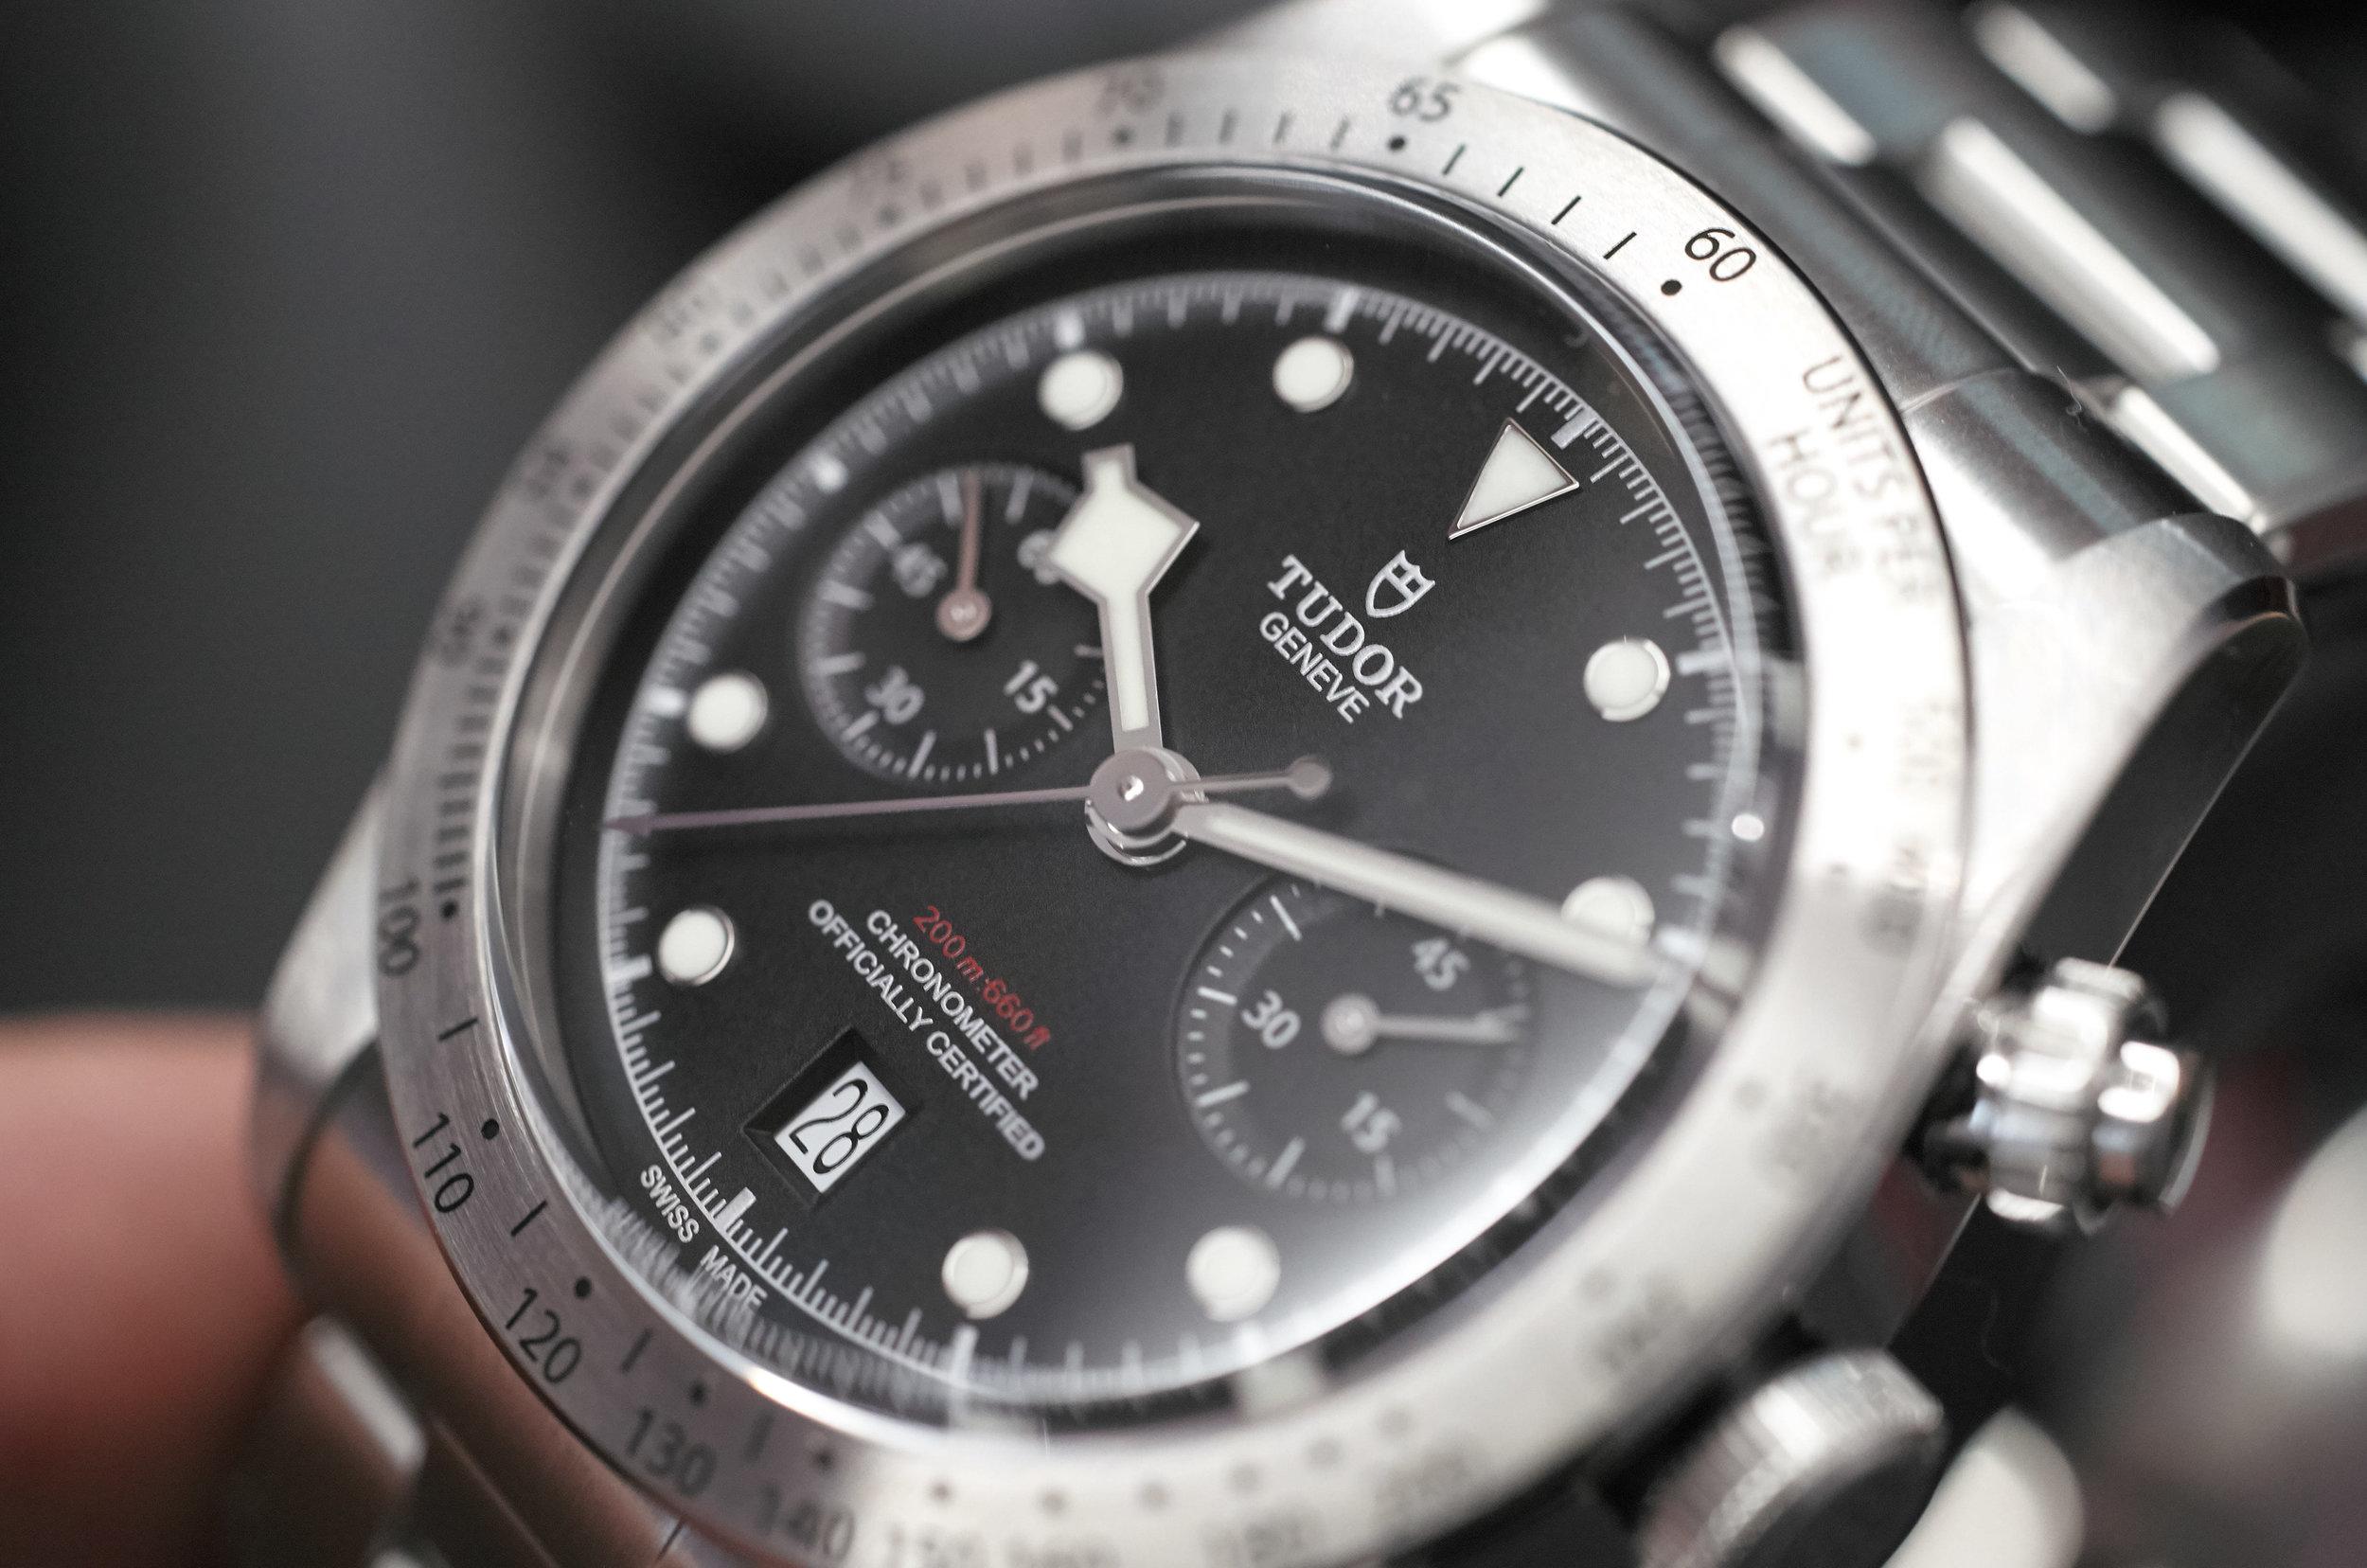 Tudor Black Bay Chronograph on bracelet